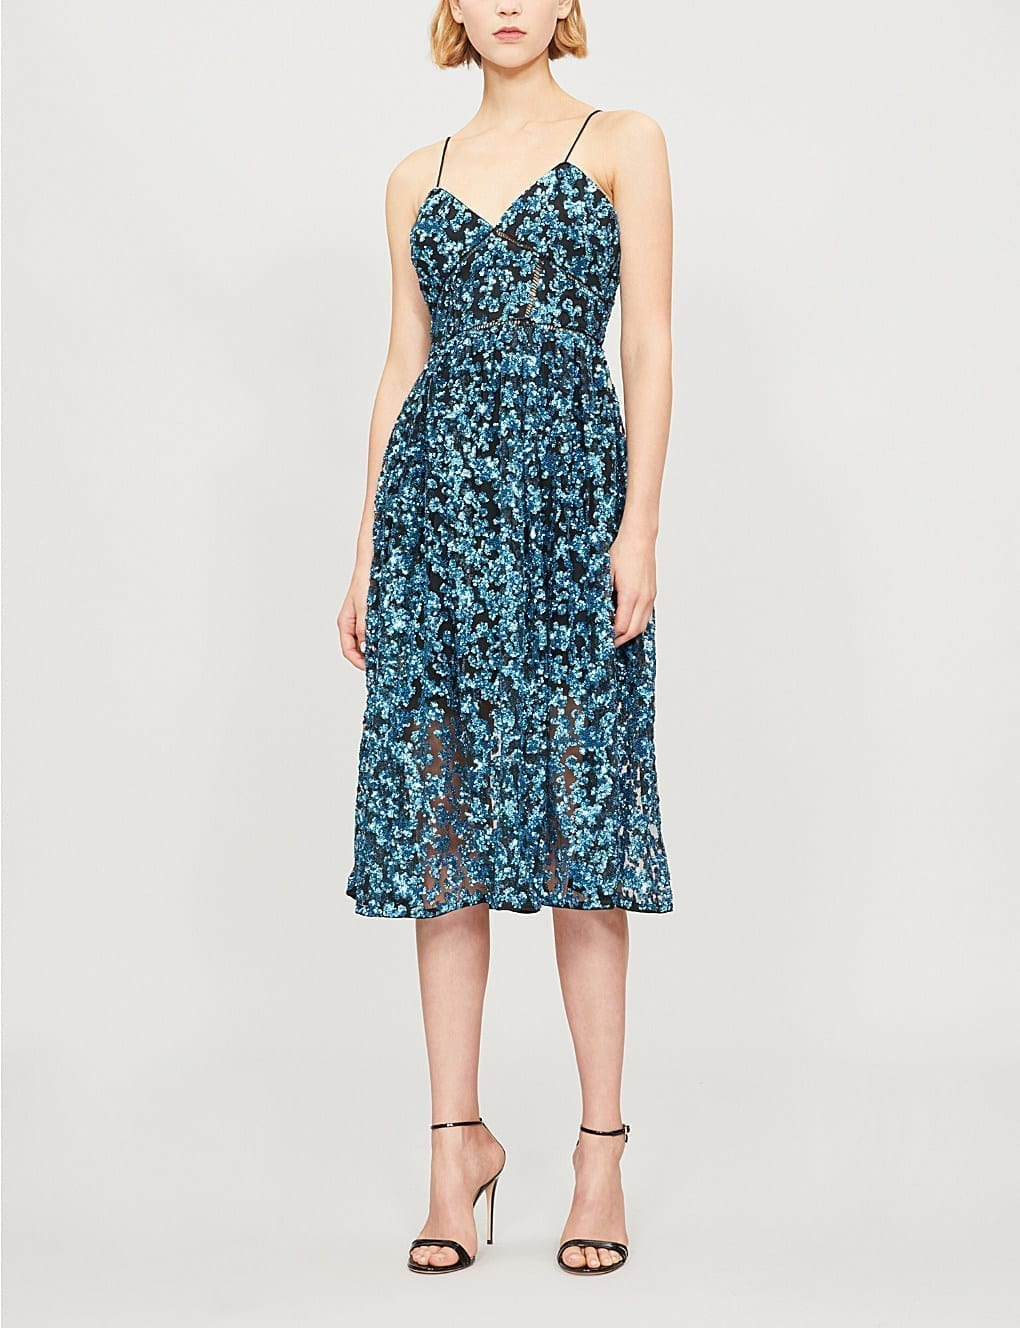 2272e31da226 SELF-PORTRAIT Sequin Azaelea Midi Blue Dress - We Select Dresses